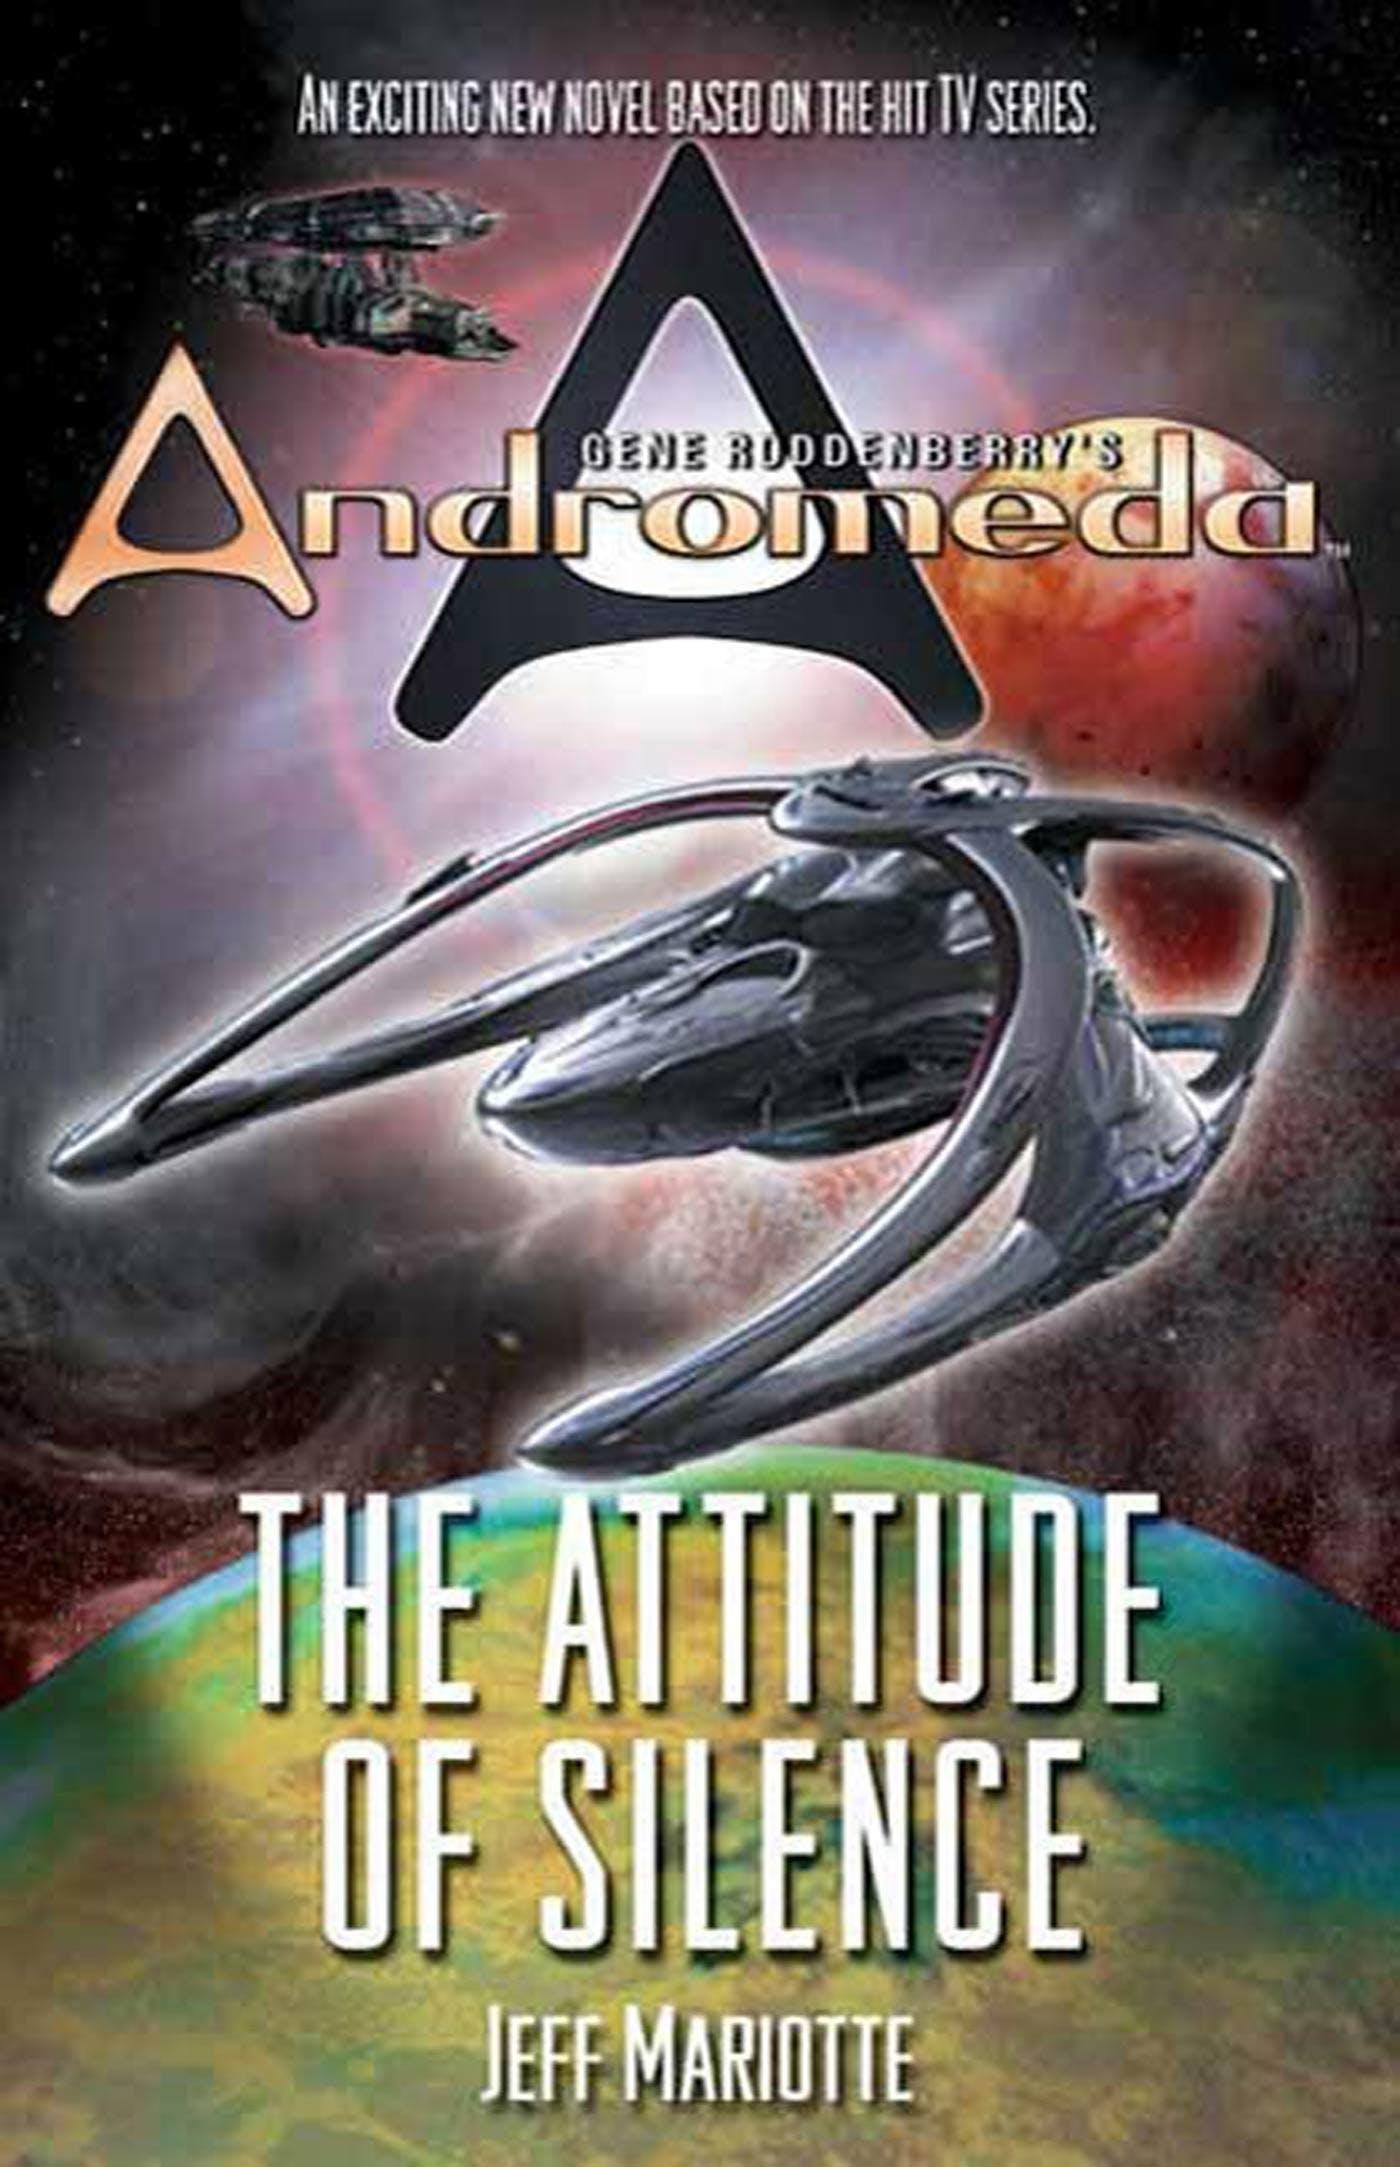 Image of Gene Roddenberry's Andromeda: The Attitude of Silence